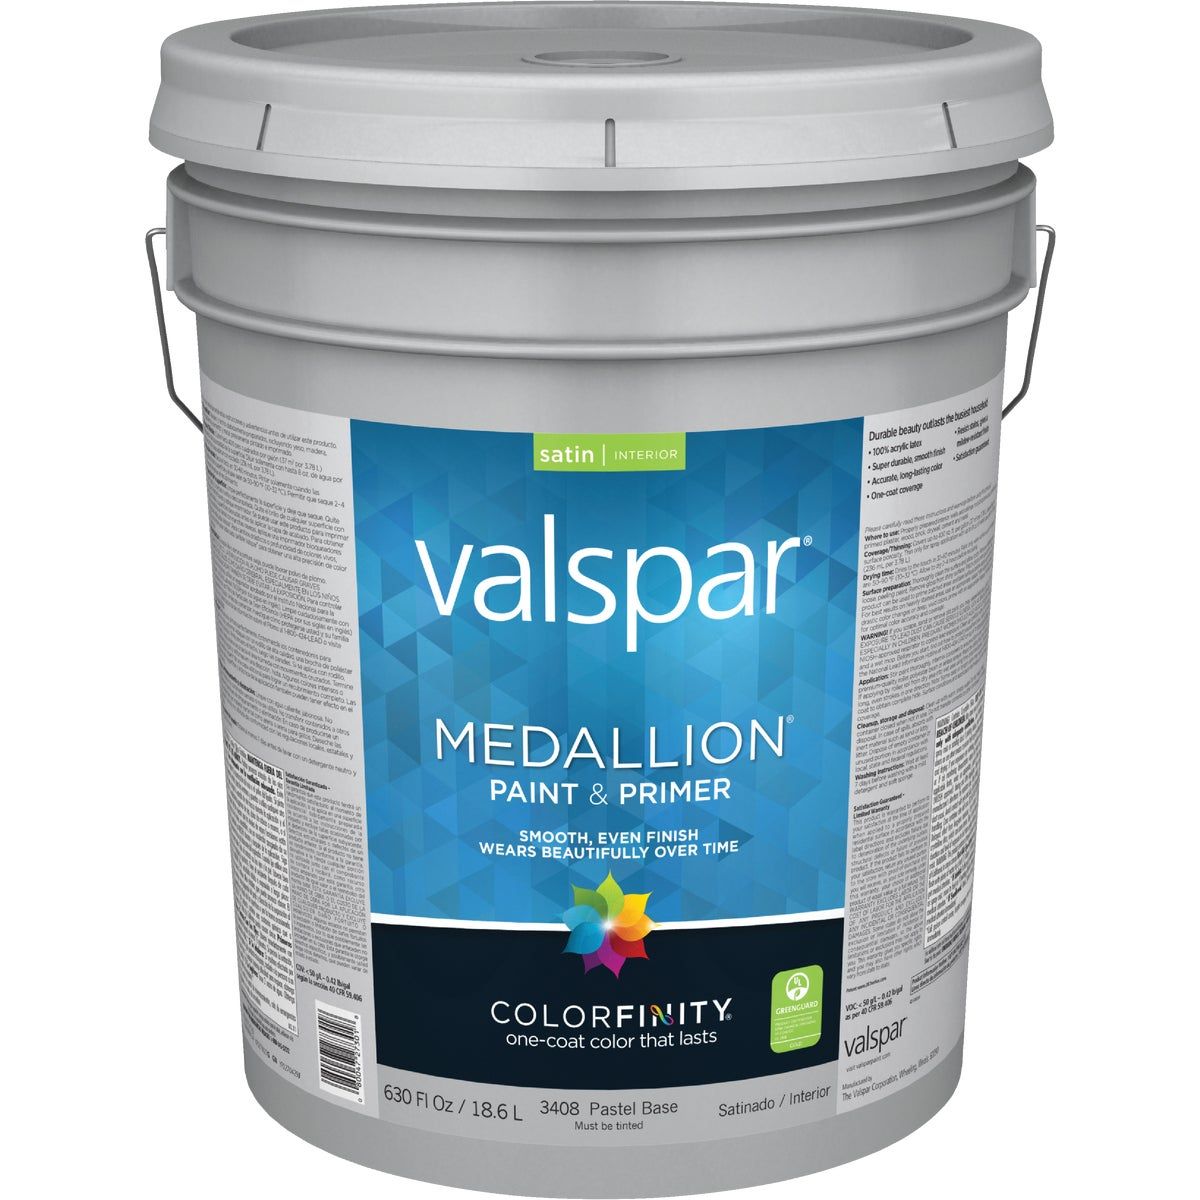 5GAL INT SATN PSTL PAINT - 027.0003408.008 by Valspar Corp